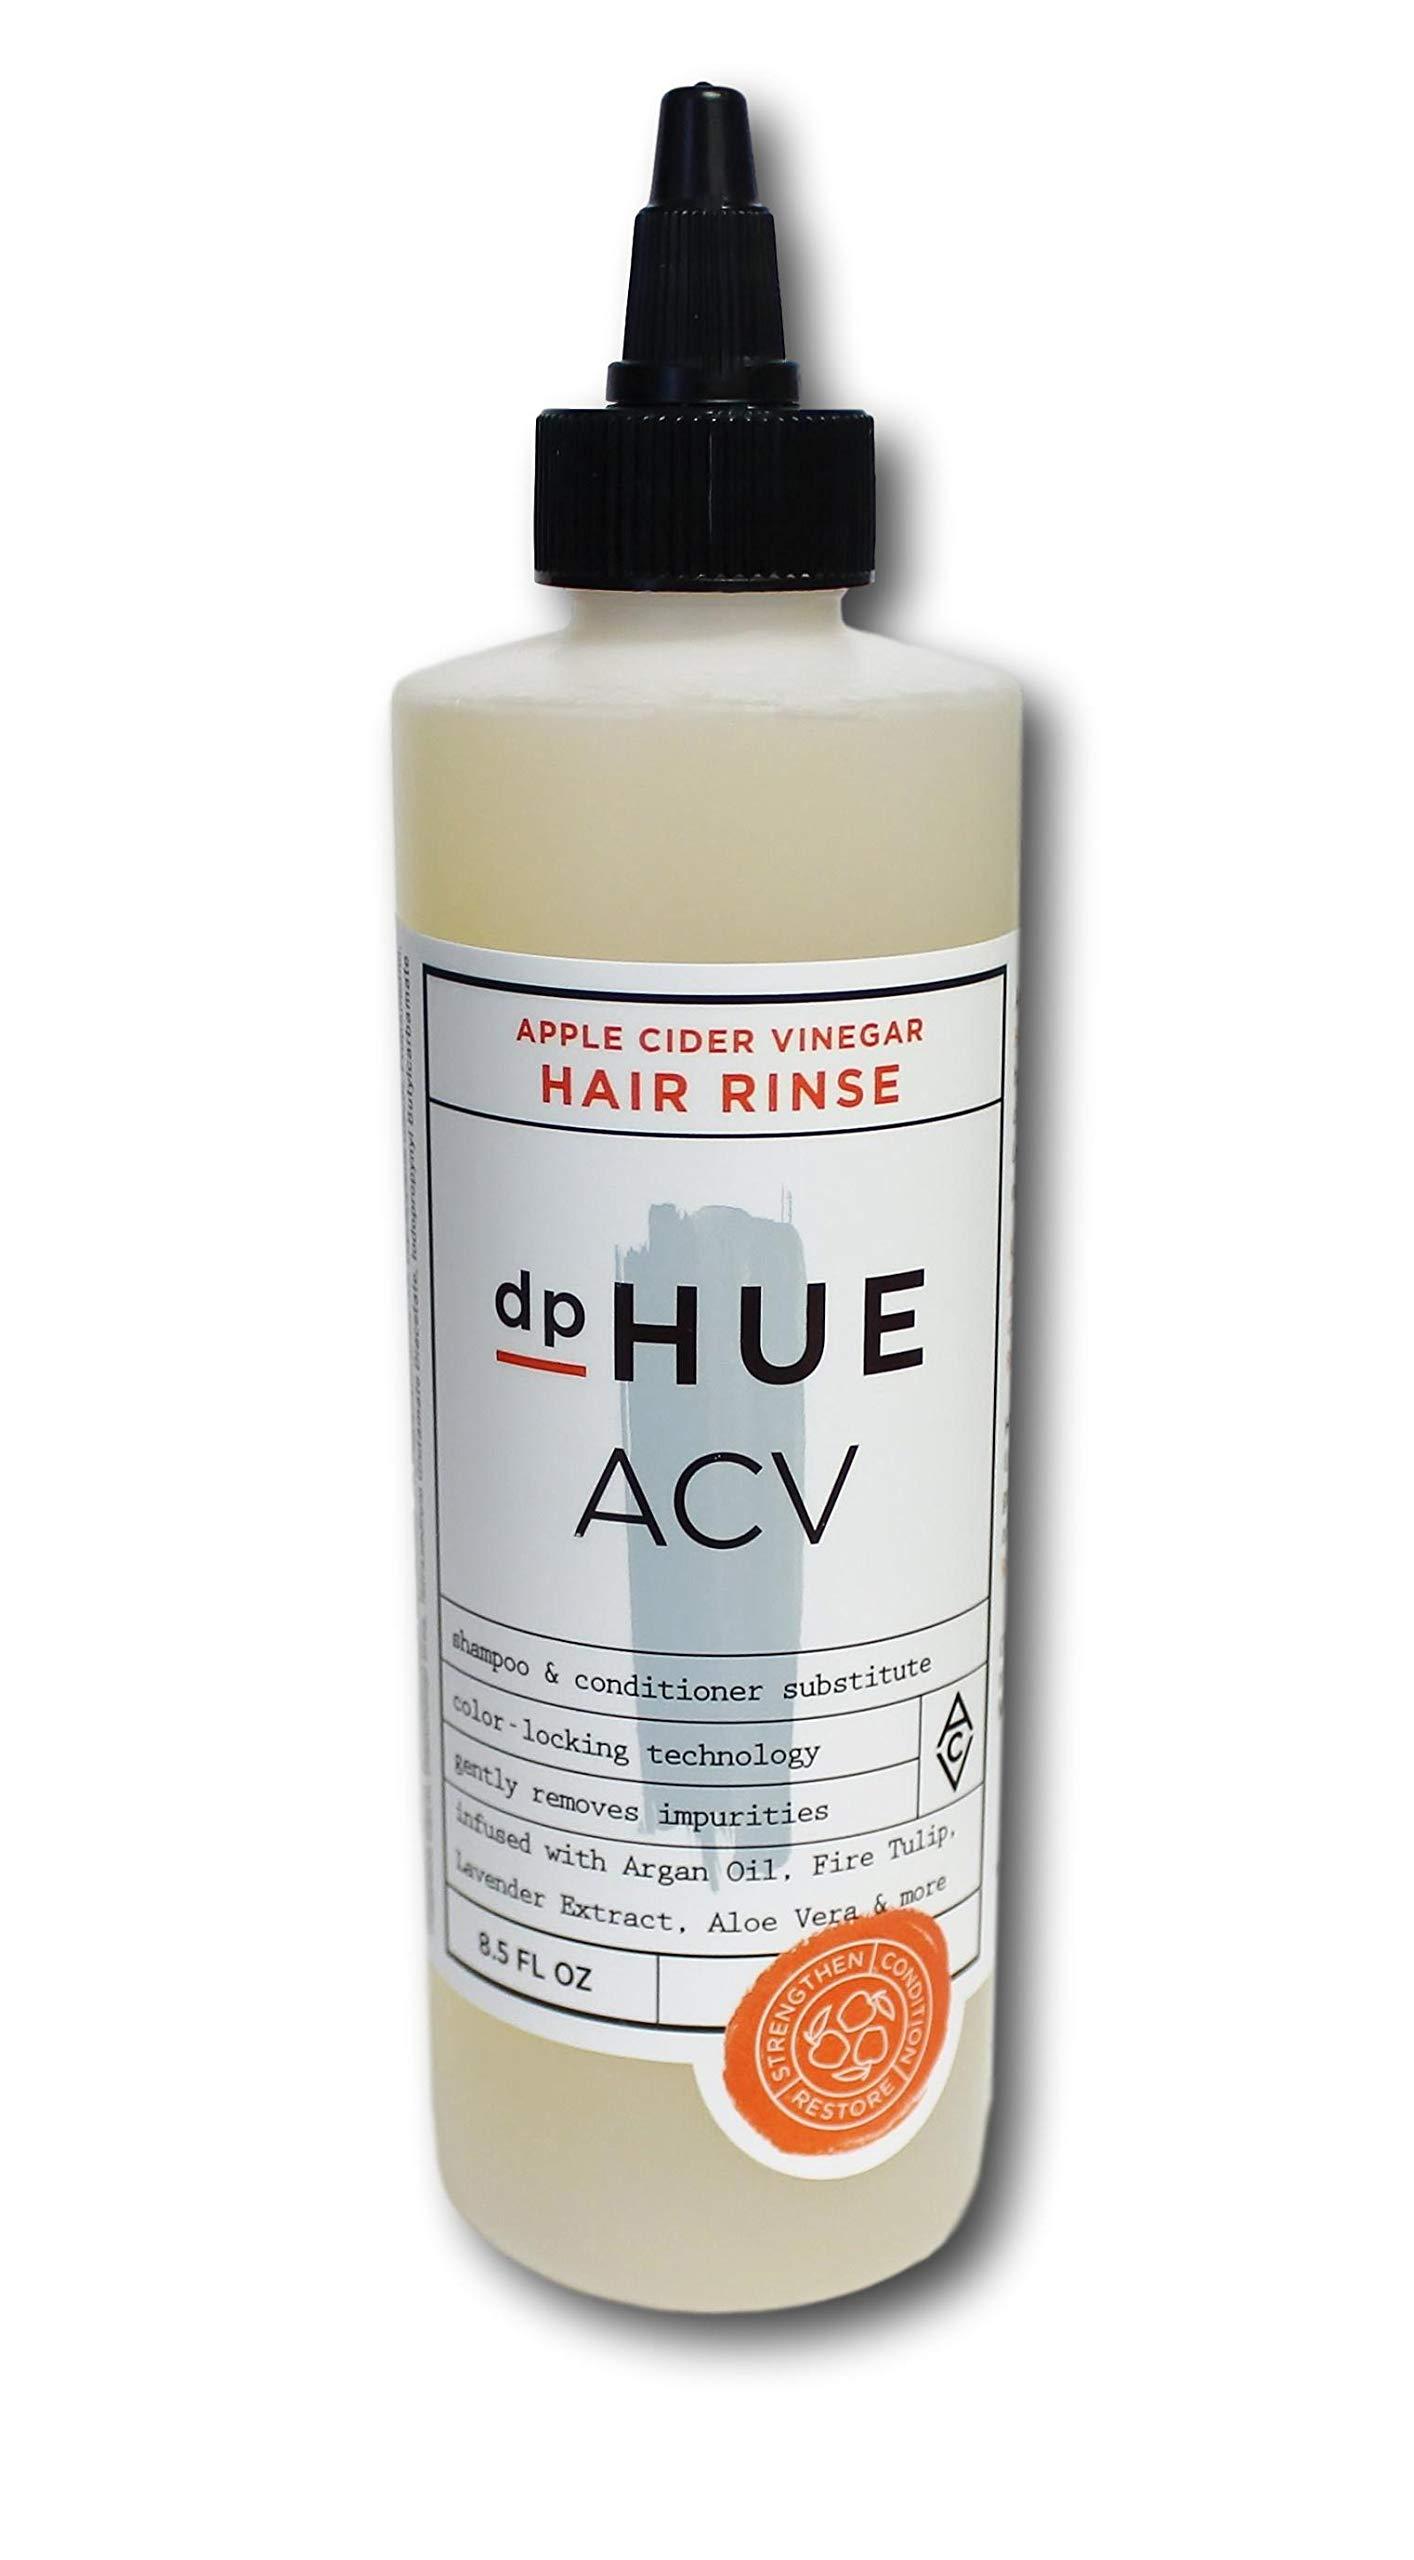 DpHue Apple Cider Vinegar Hair Rinse, 8.5 oz. by dpHUE (Image #1)